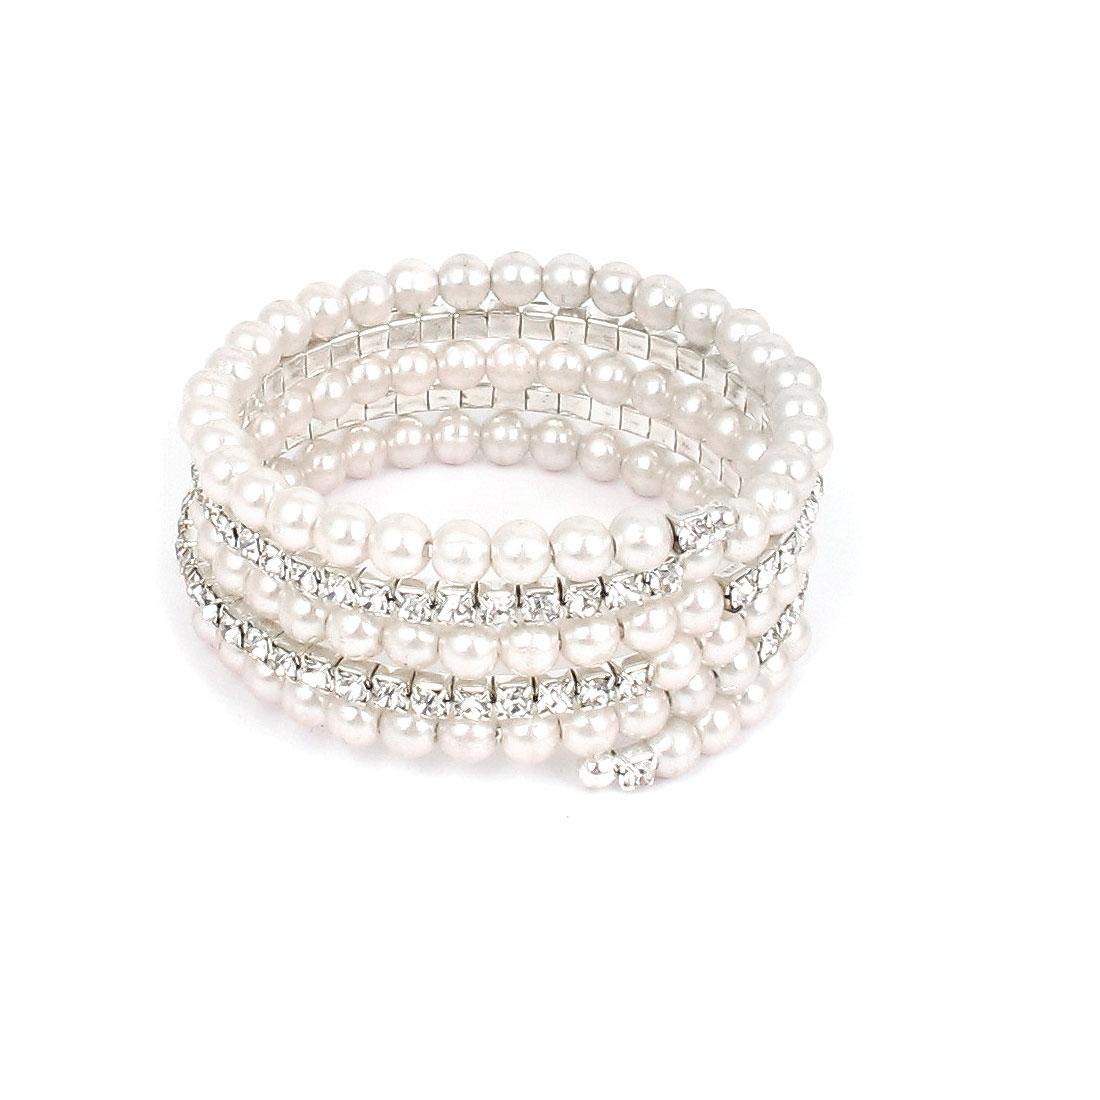 Sliver Tone Rhinestone Inlaid White Faux Pear Detailing Elastic Bracelet Wrist Bangle for Lady